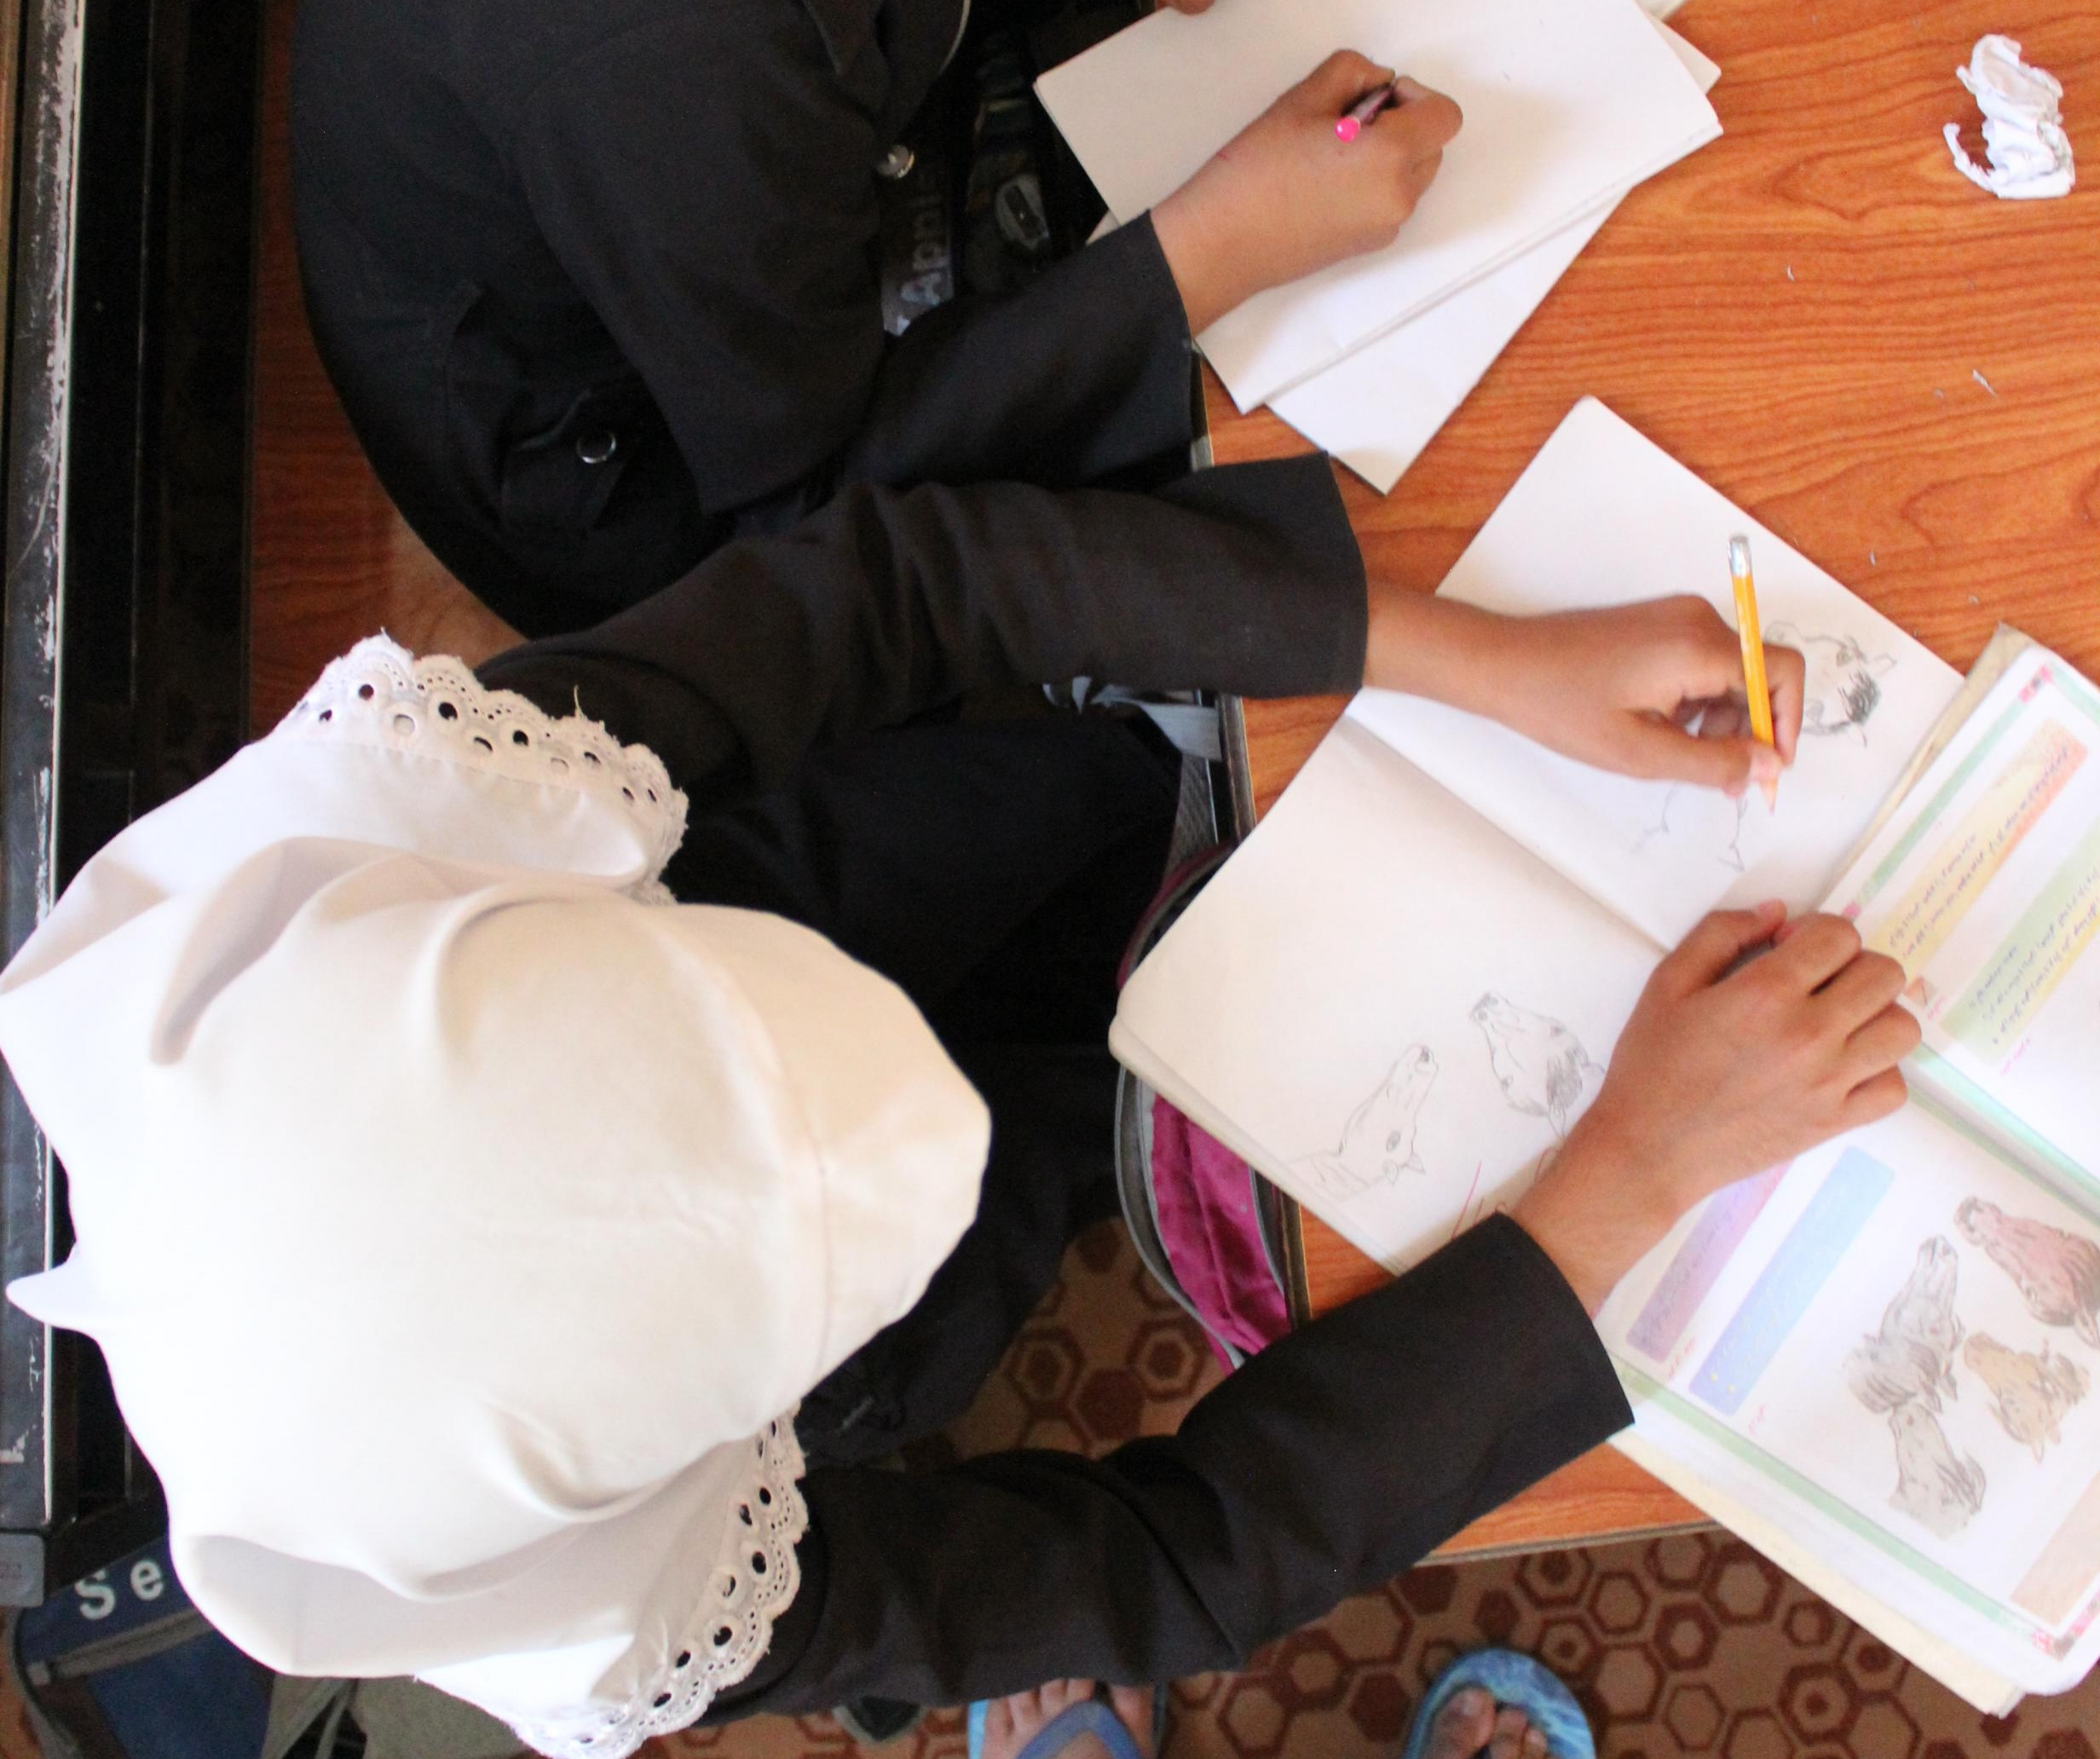 Ali-Sajad - #3008 | MaleAge When Starting School: 10